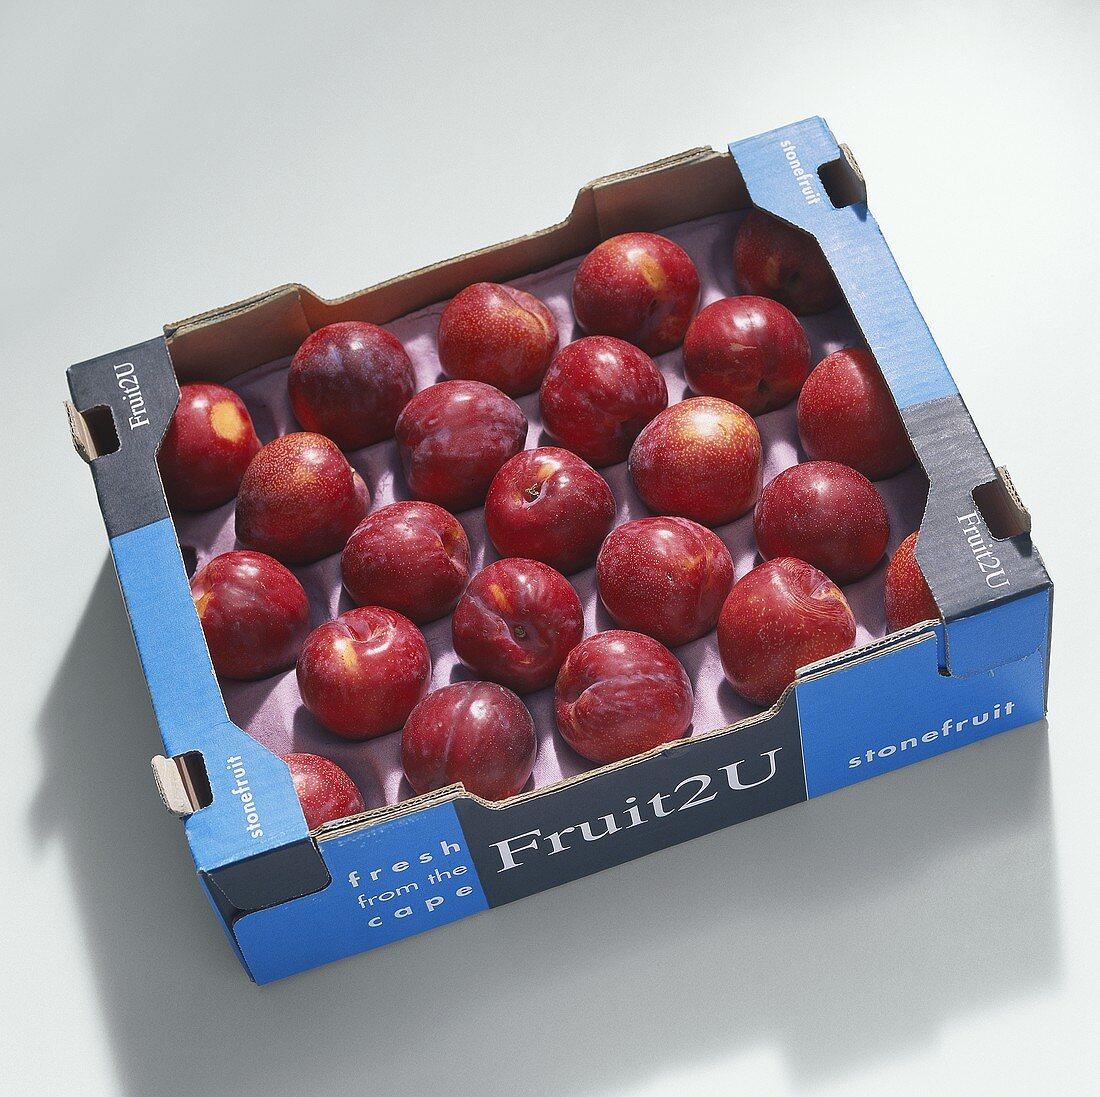 Red Lady plums (Prunus domestica, S. Africa) in packaging